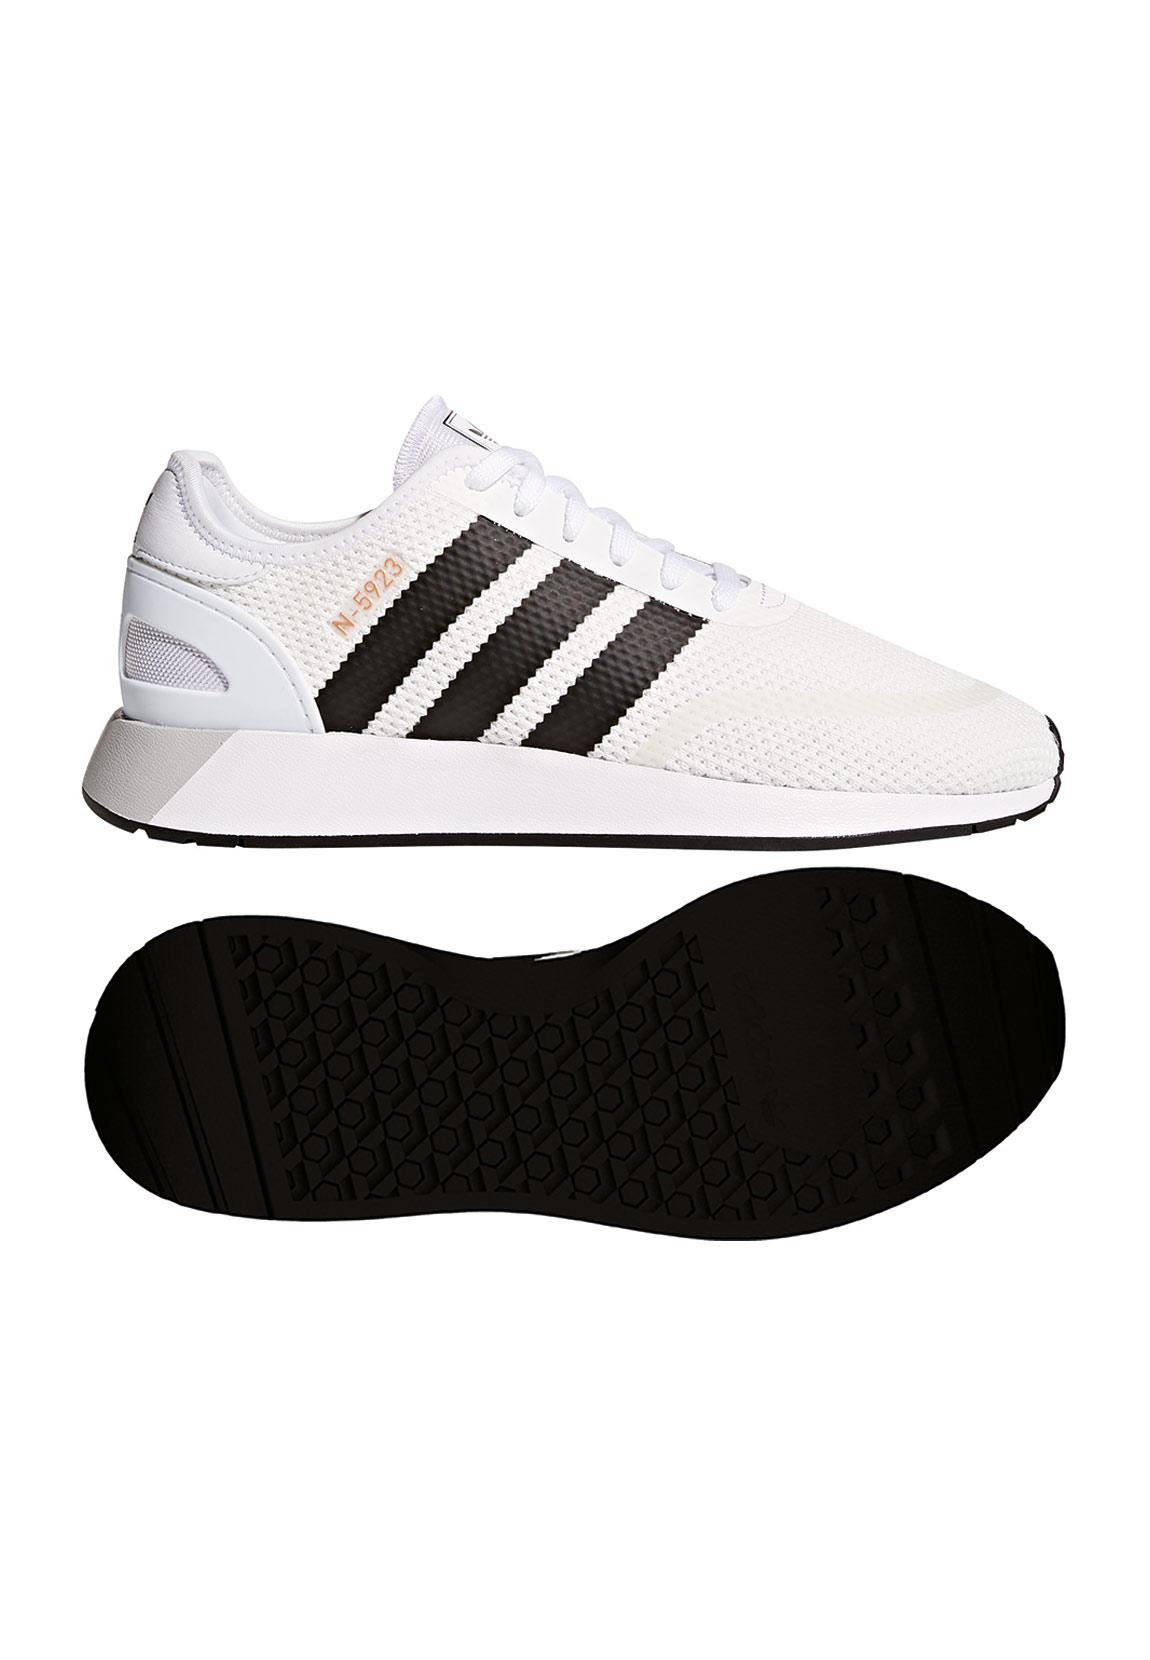 Adidas Turnschuhe INIKI N 5923 AH2159 Weiß Schuhe Herren